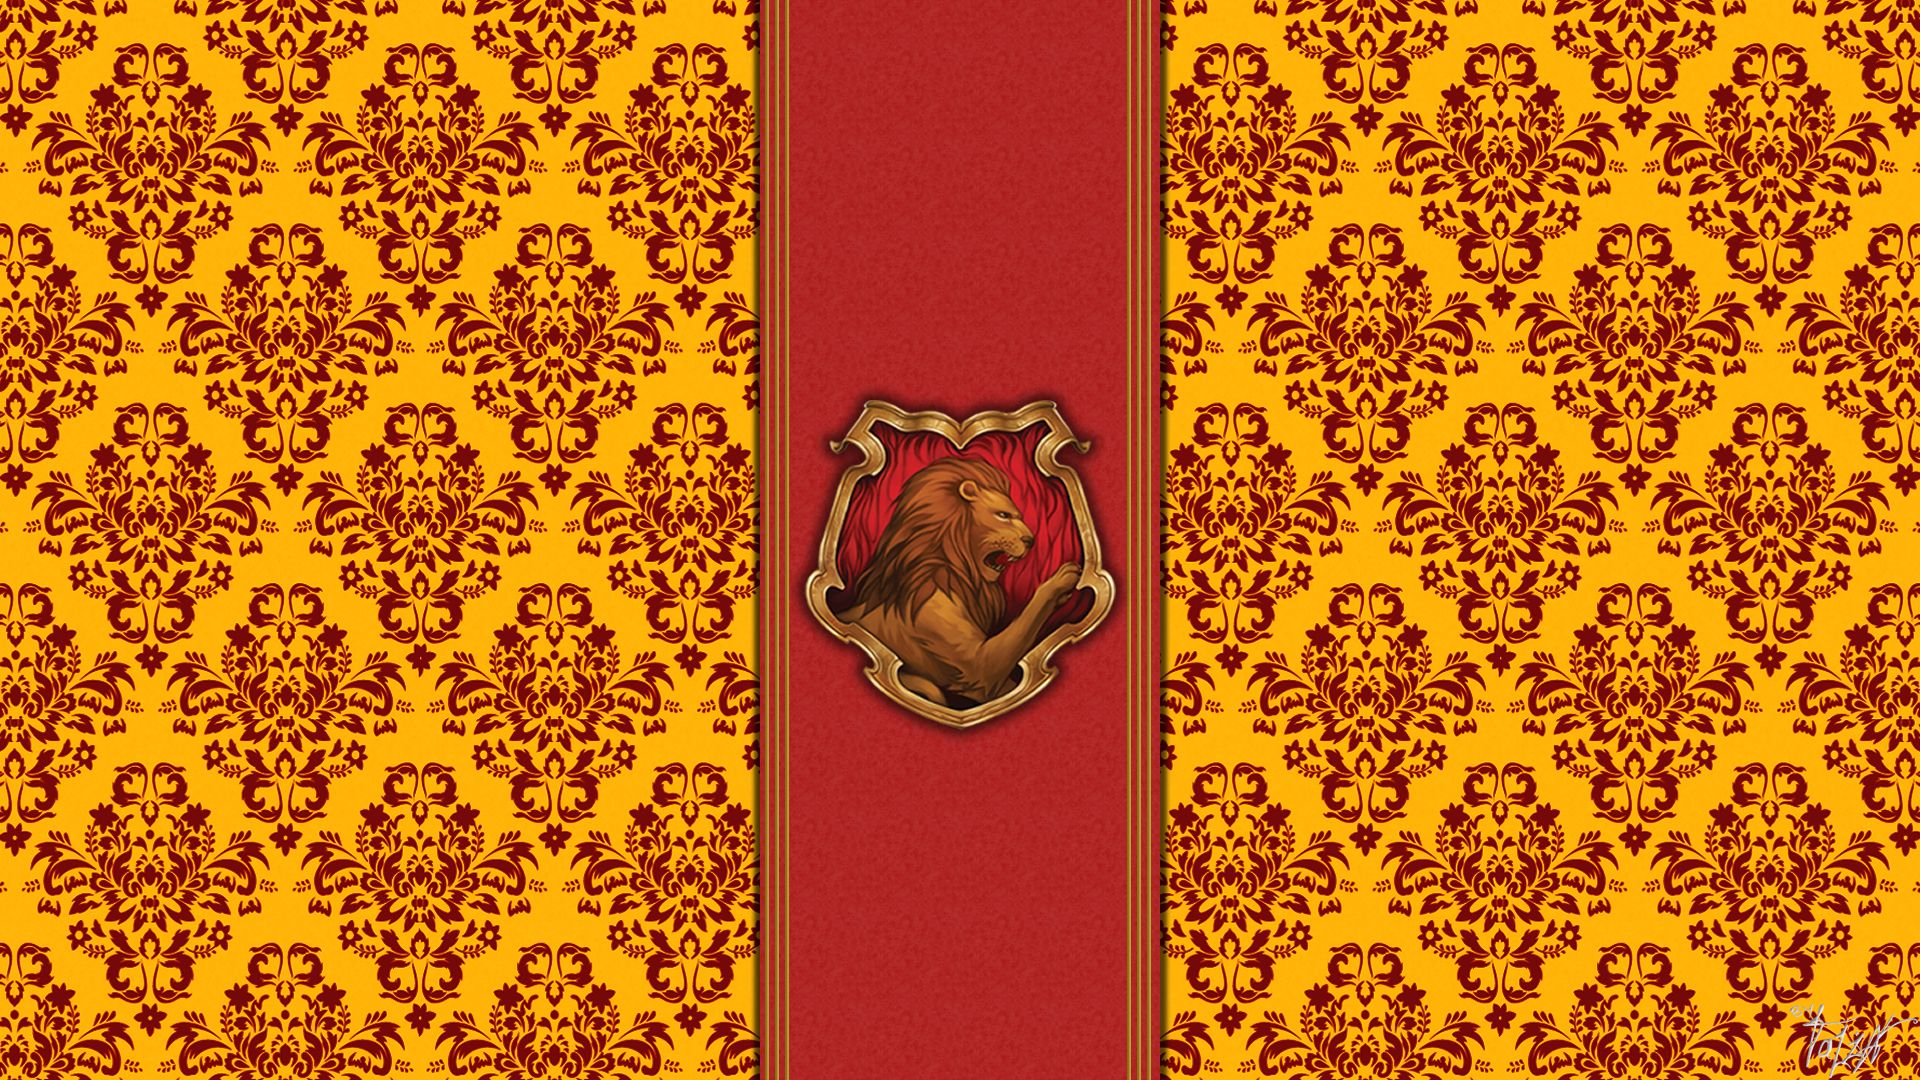 Wonderful Wallpaper Harry Potter Emoji - a7770ae0c733ed0c484975364d4f4662  Photograph_462252.jpg